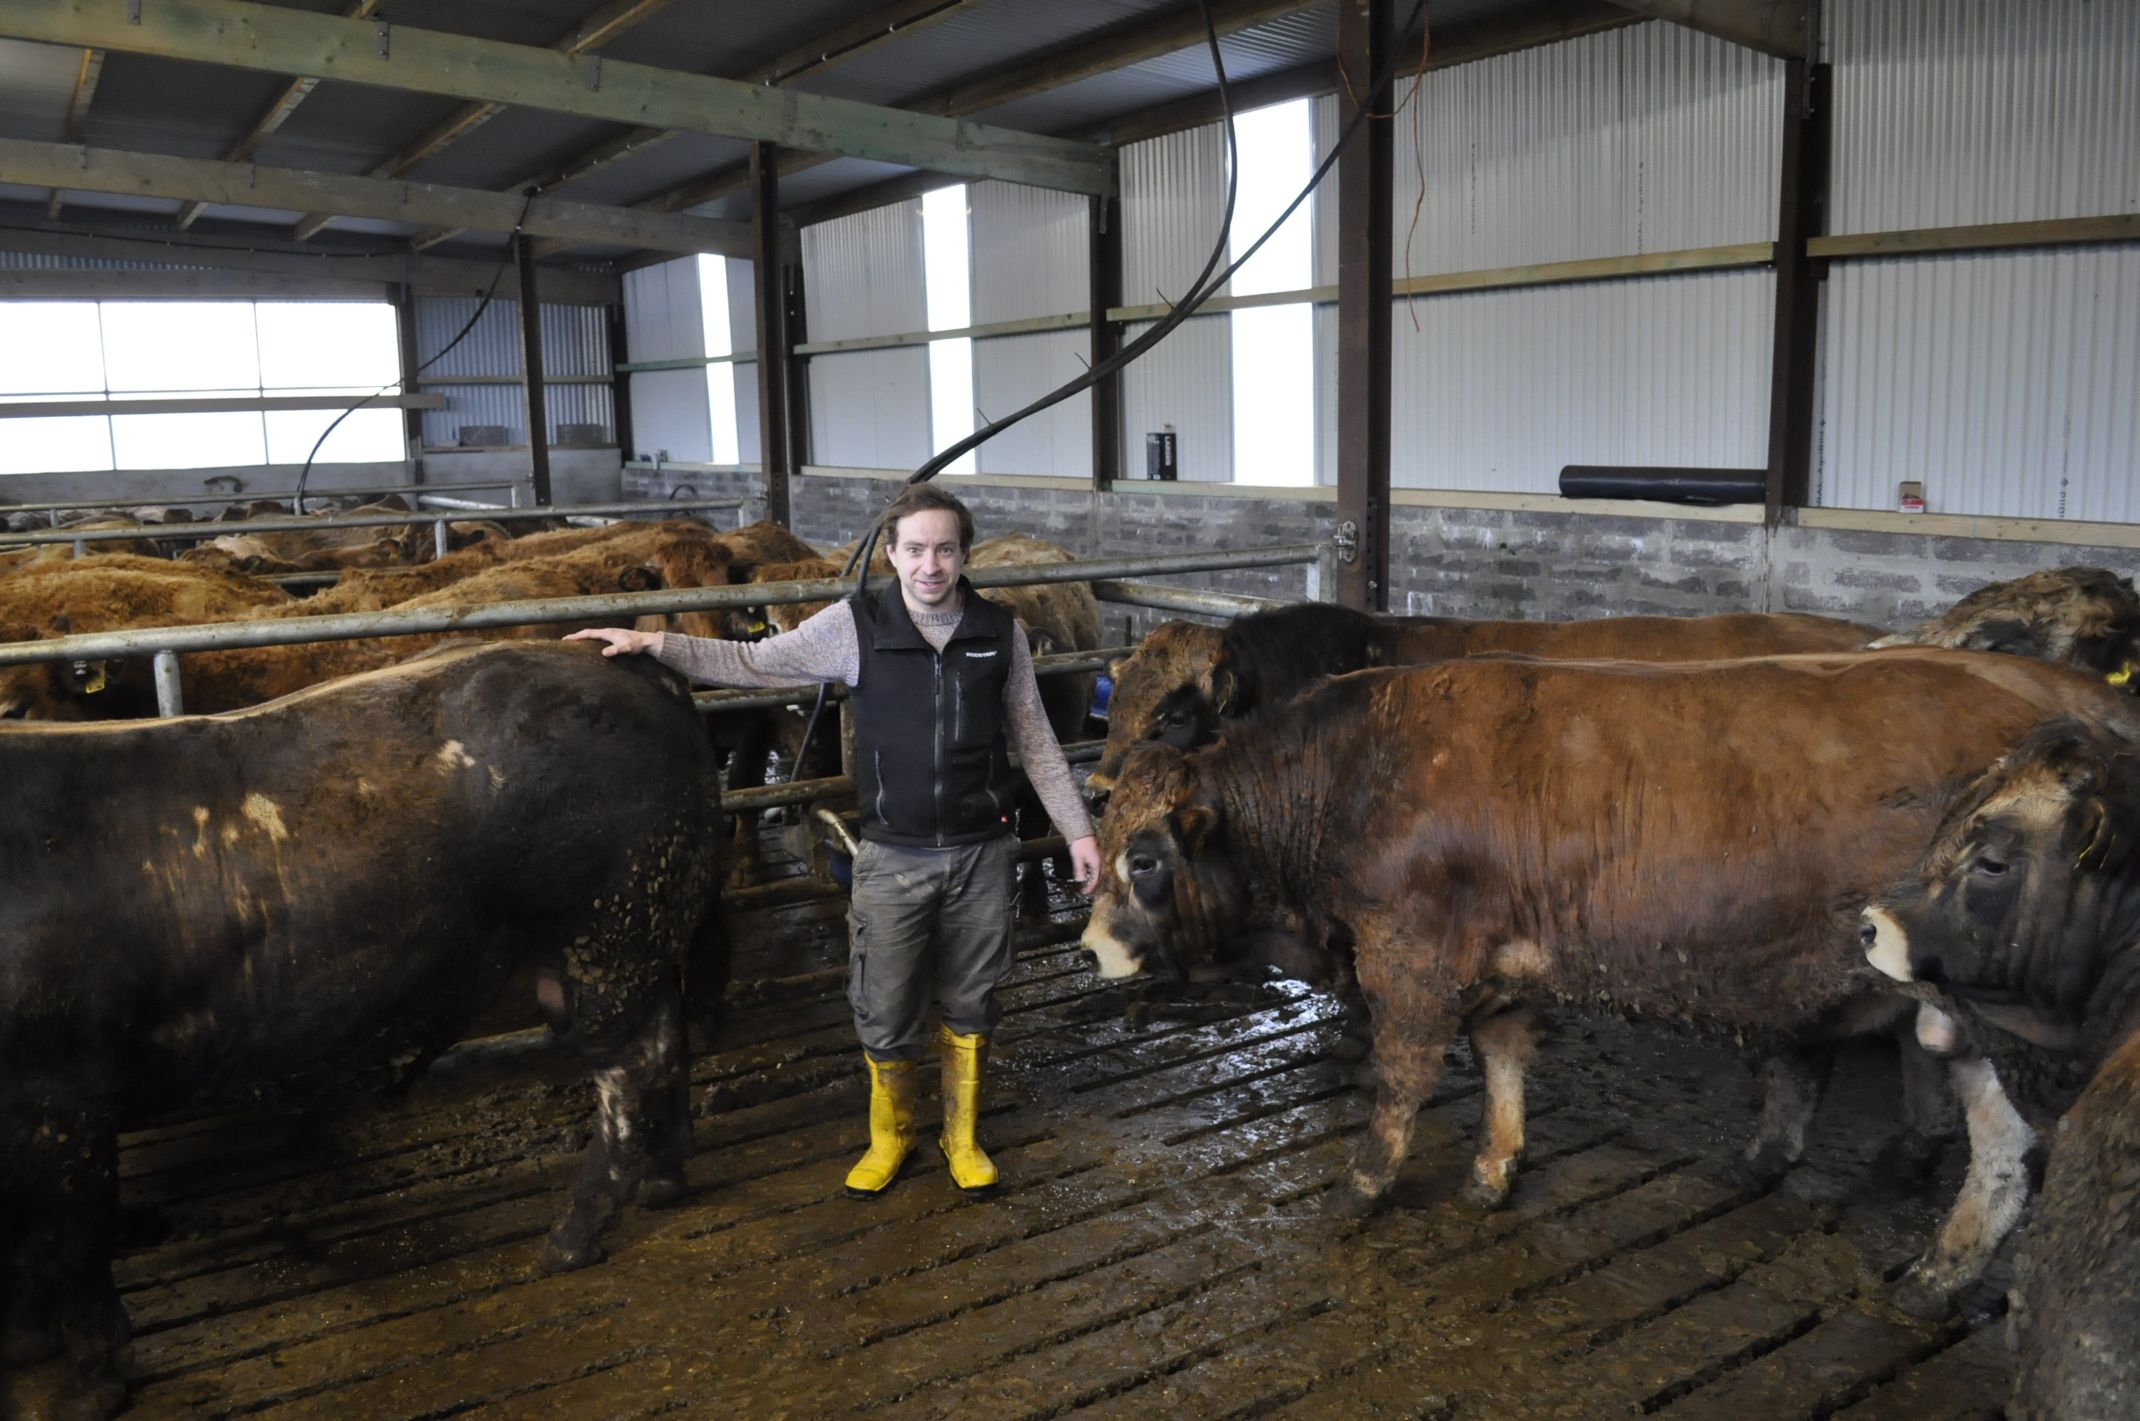 Aubracs, bulls, cattle, animals, livestock, Cork, shed